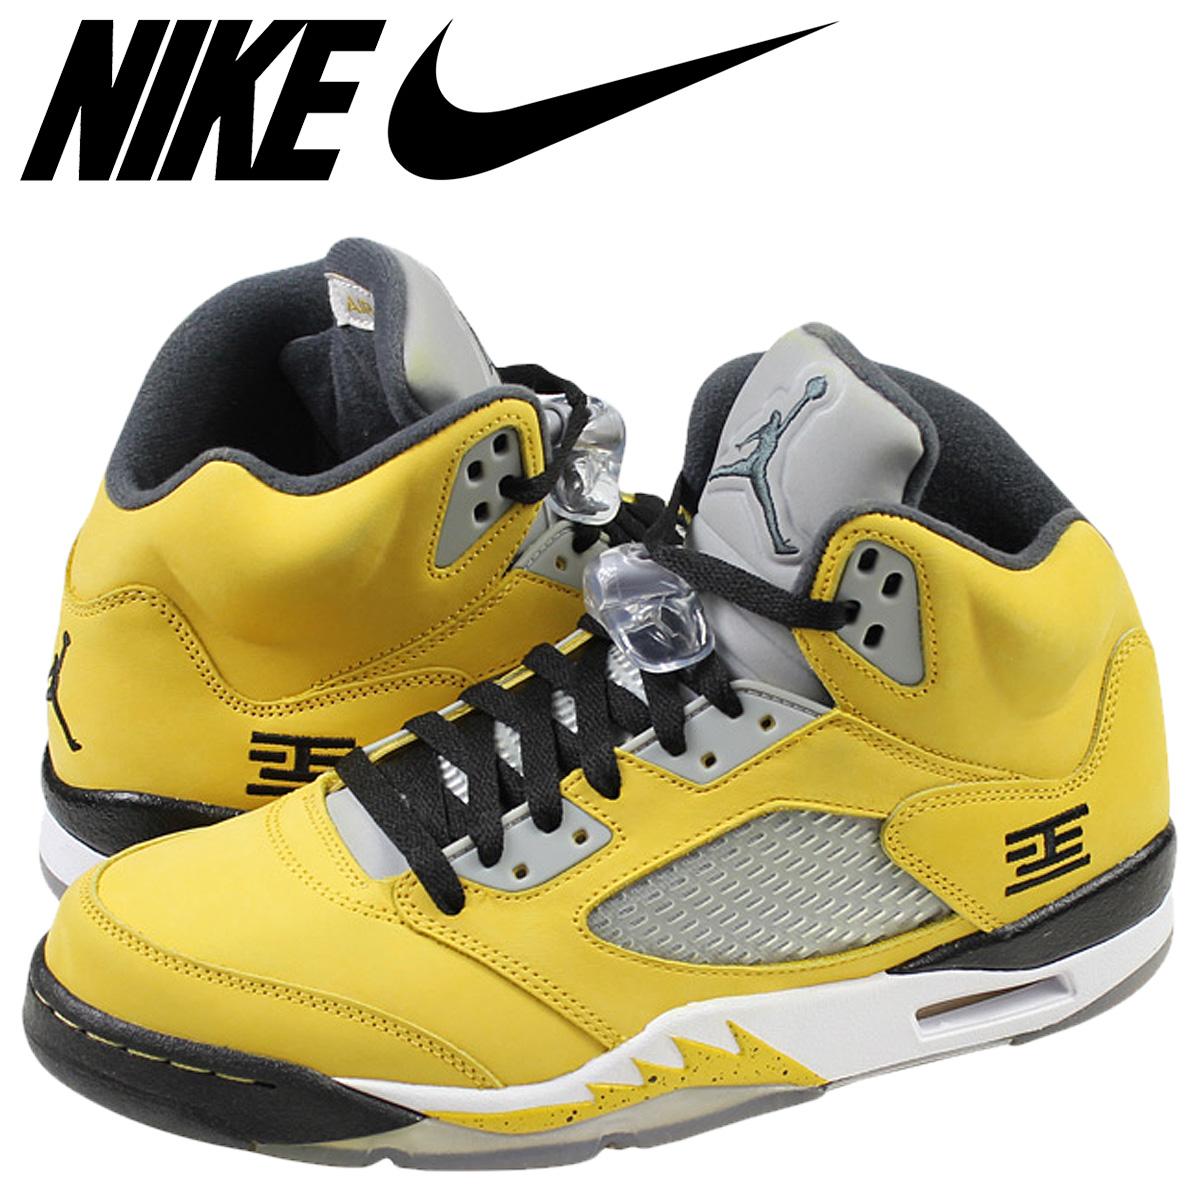 wholesale best place no sale tax NIKE Nike Air Jordan sneakers AIR JORDAN 5 RETRO T23 Air Jordan 5 nostalgic  T23 454,783-701 yellow men